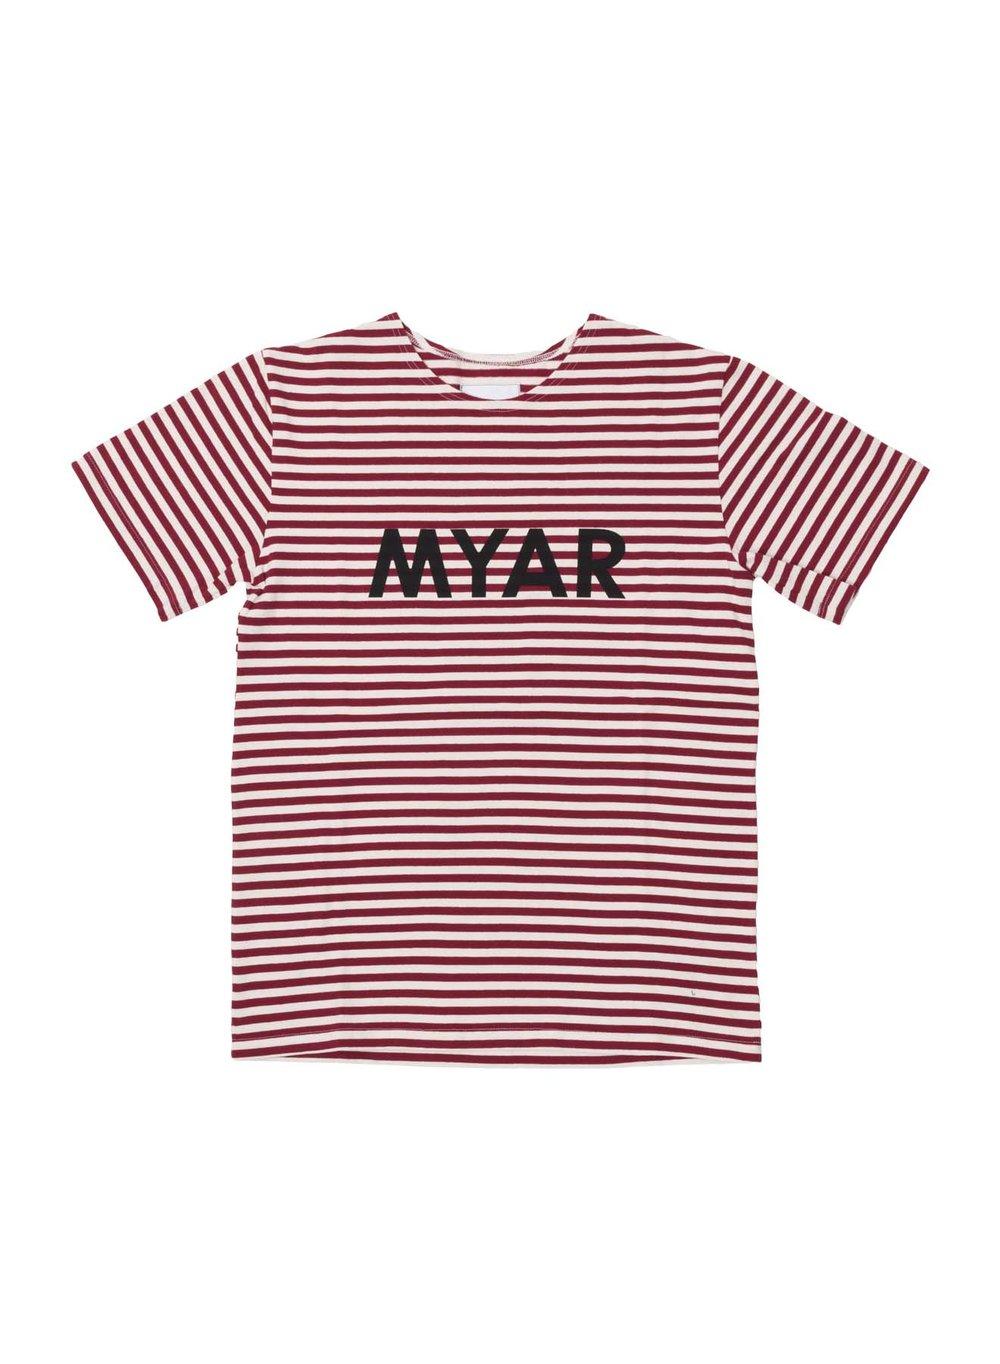 MYAR_RUT0M.jpg